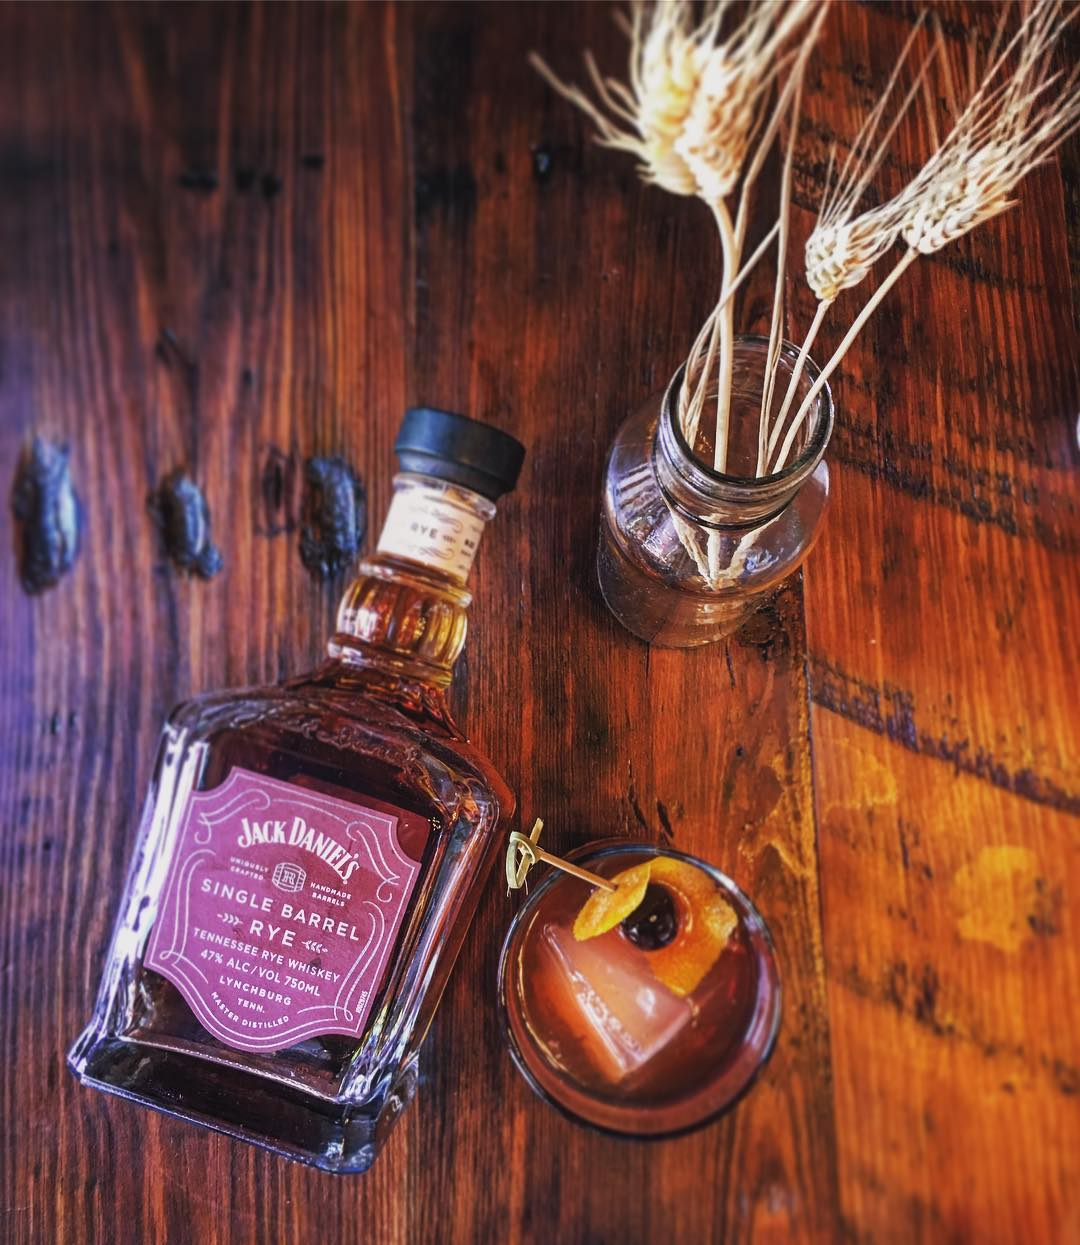 Jack Daniel's Single Barrel Rye… pretty tasty old fashioned @savwhiskeysipper…